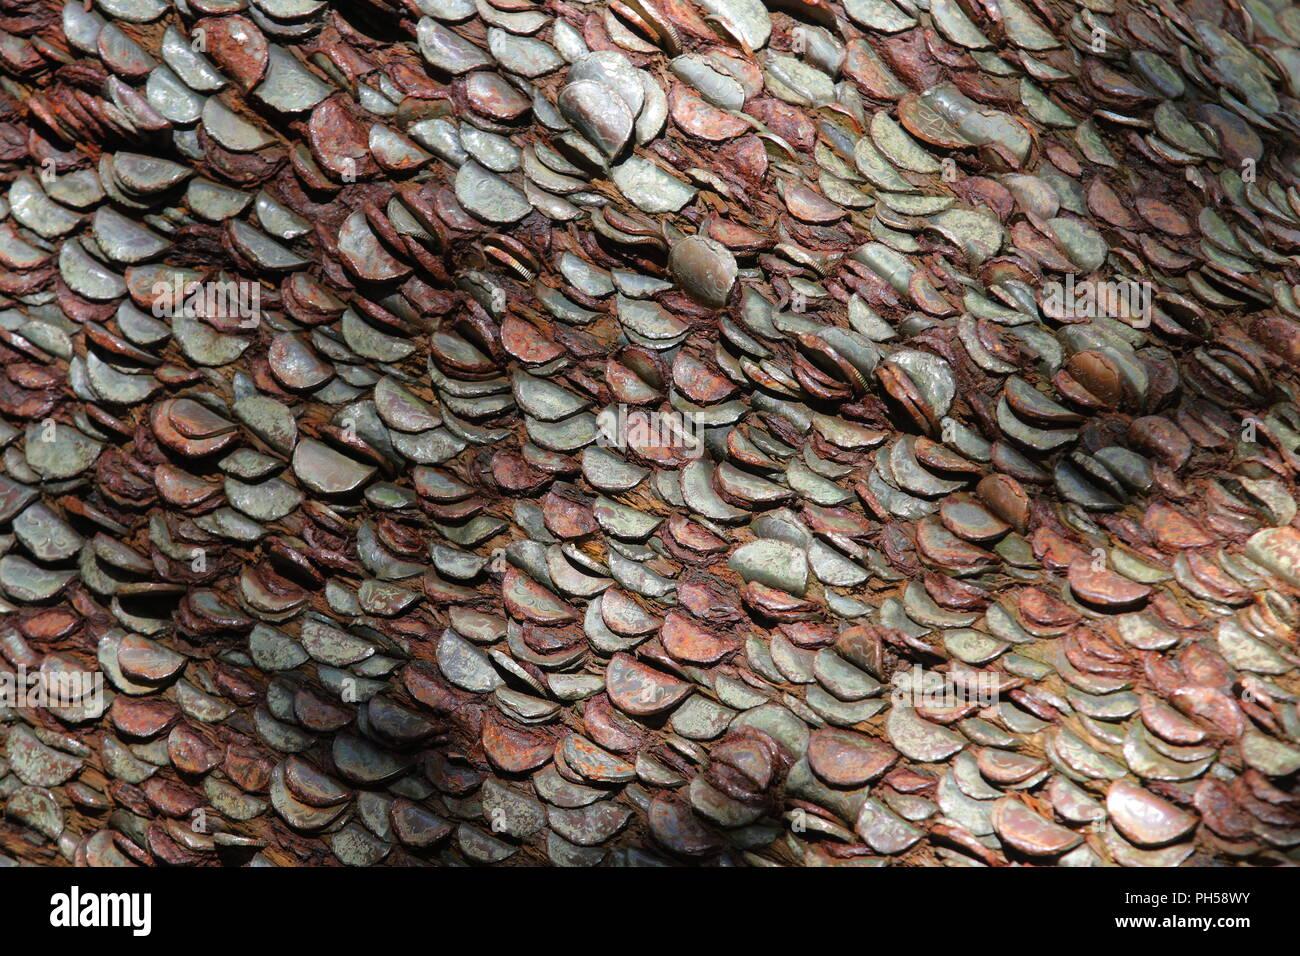 Money Tree Coins Stock Photos & Money Tree Coins Stock Images - Alamy